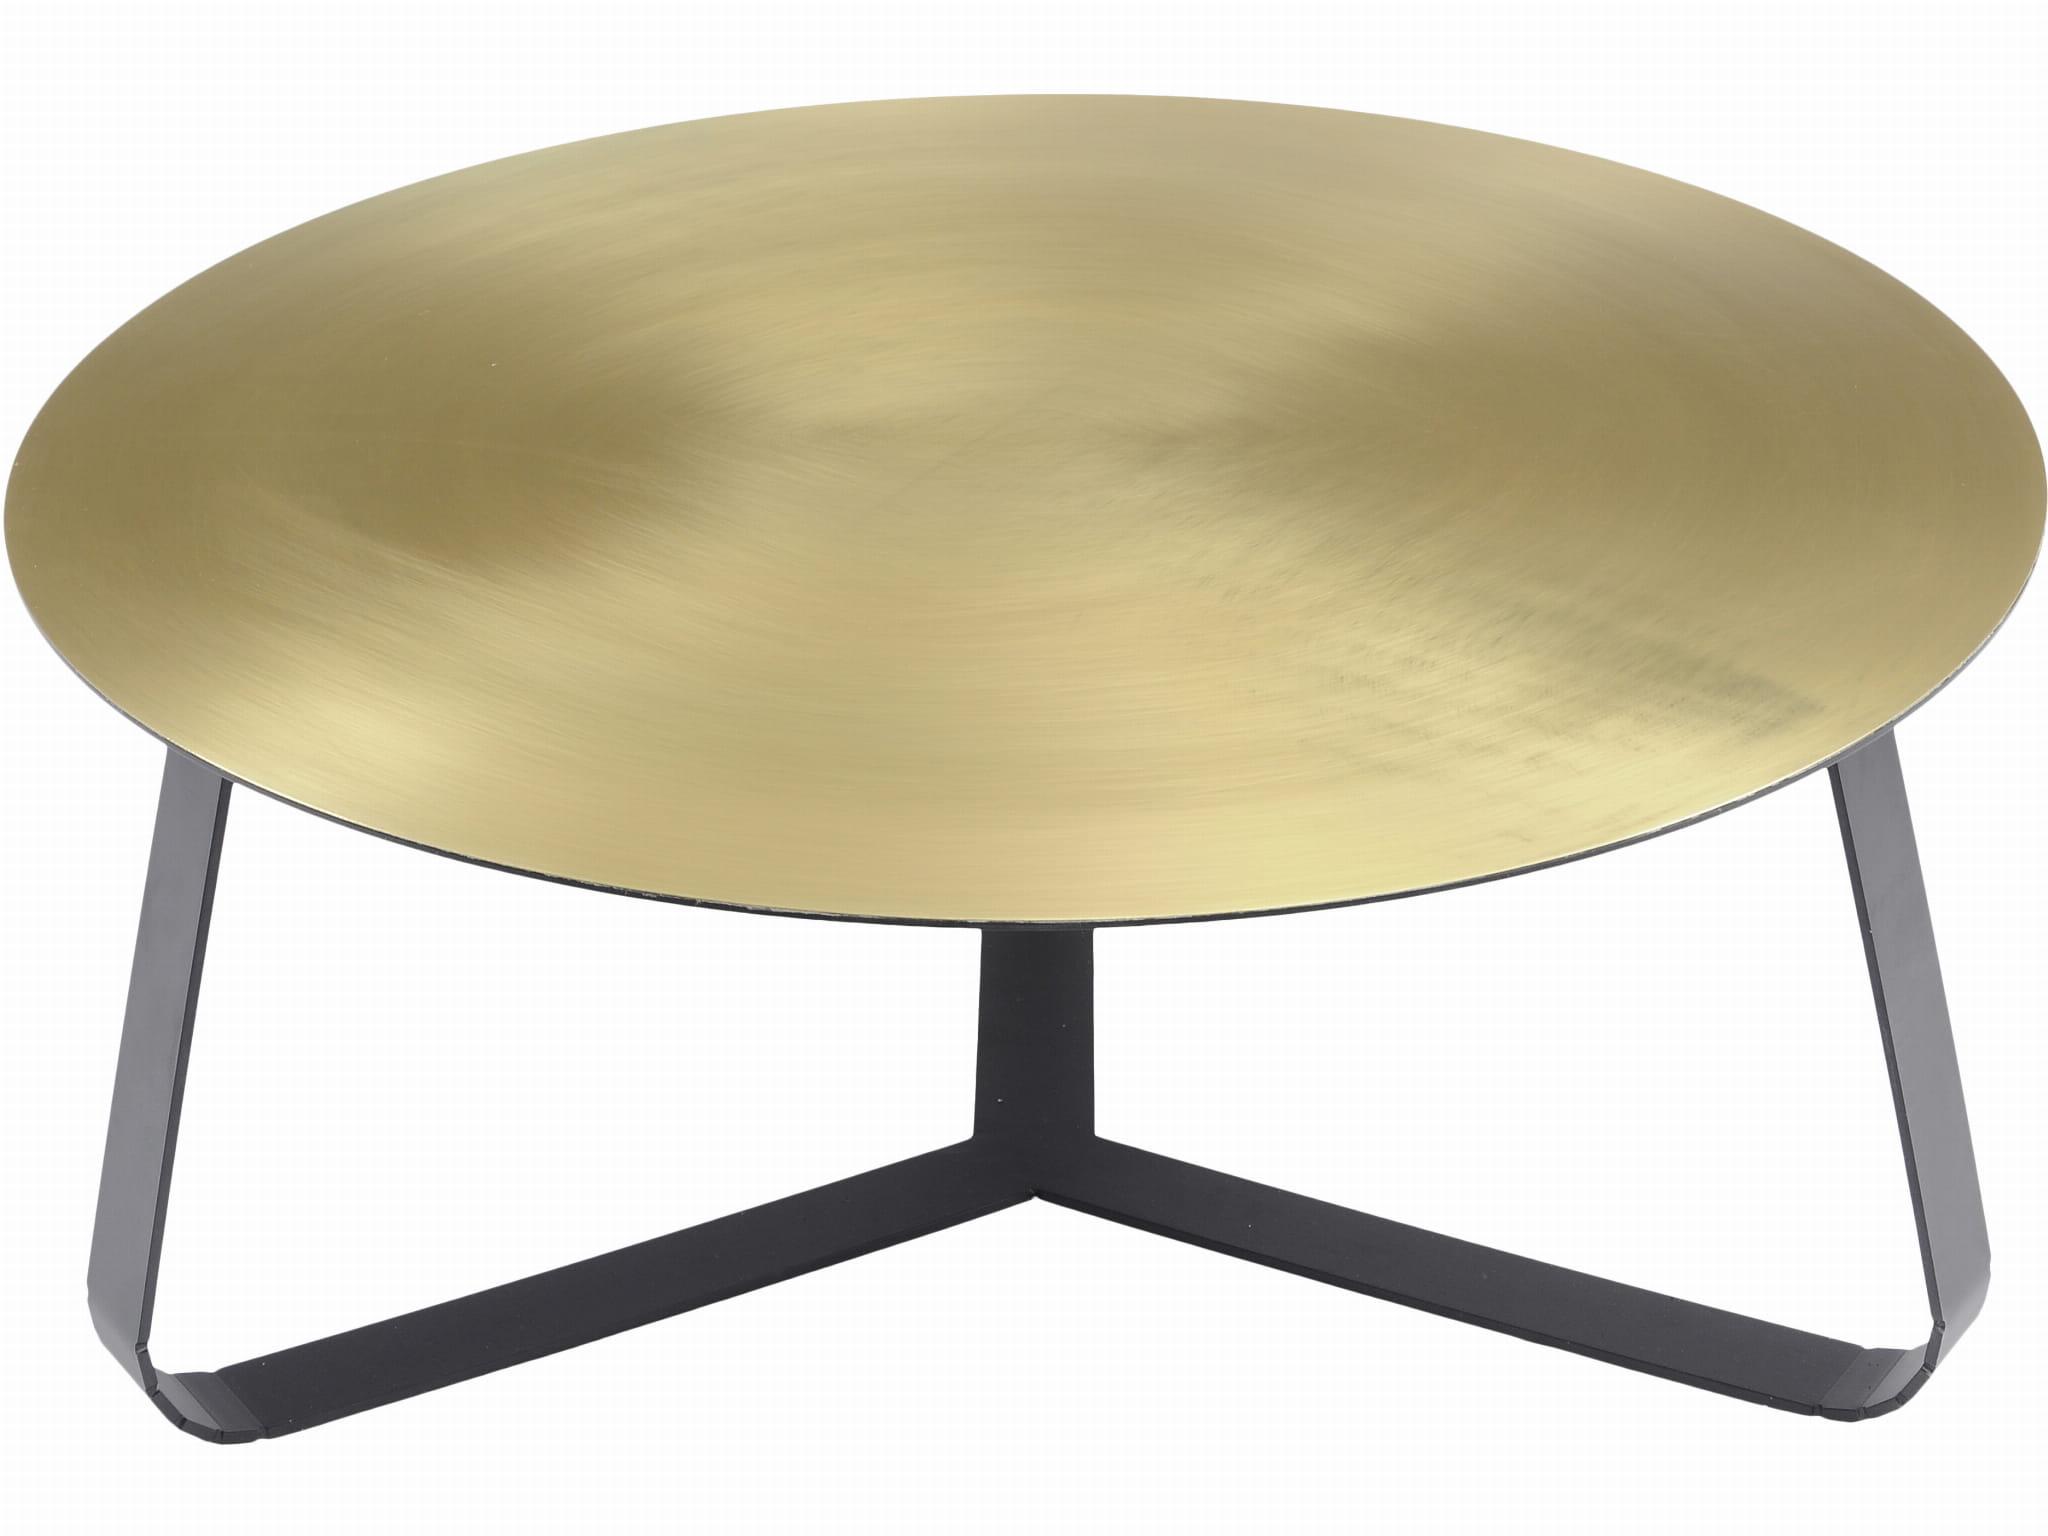 Belgrave Brass Round Coffee Table 80 Cm With Black Steel Frame K B London